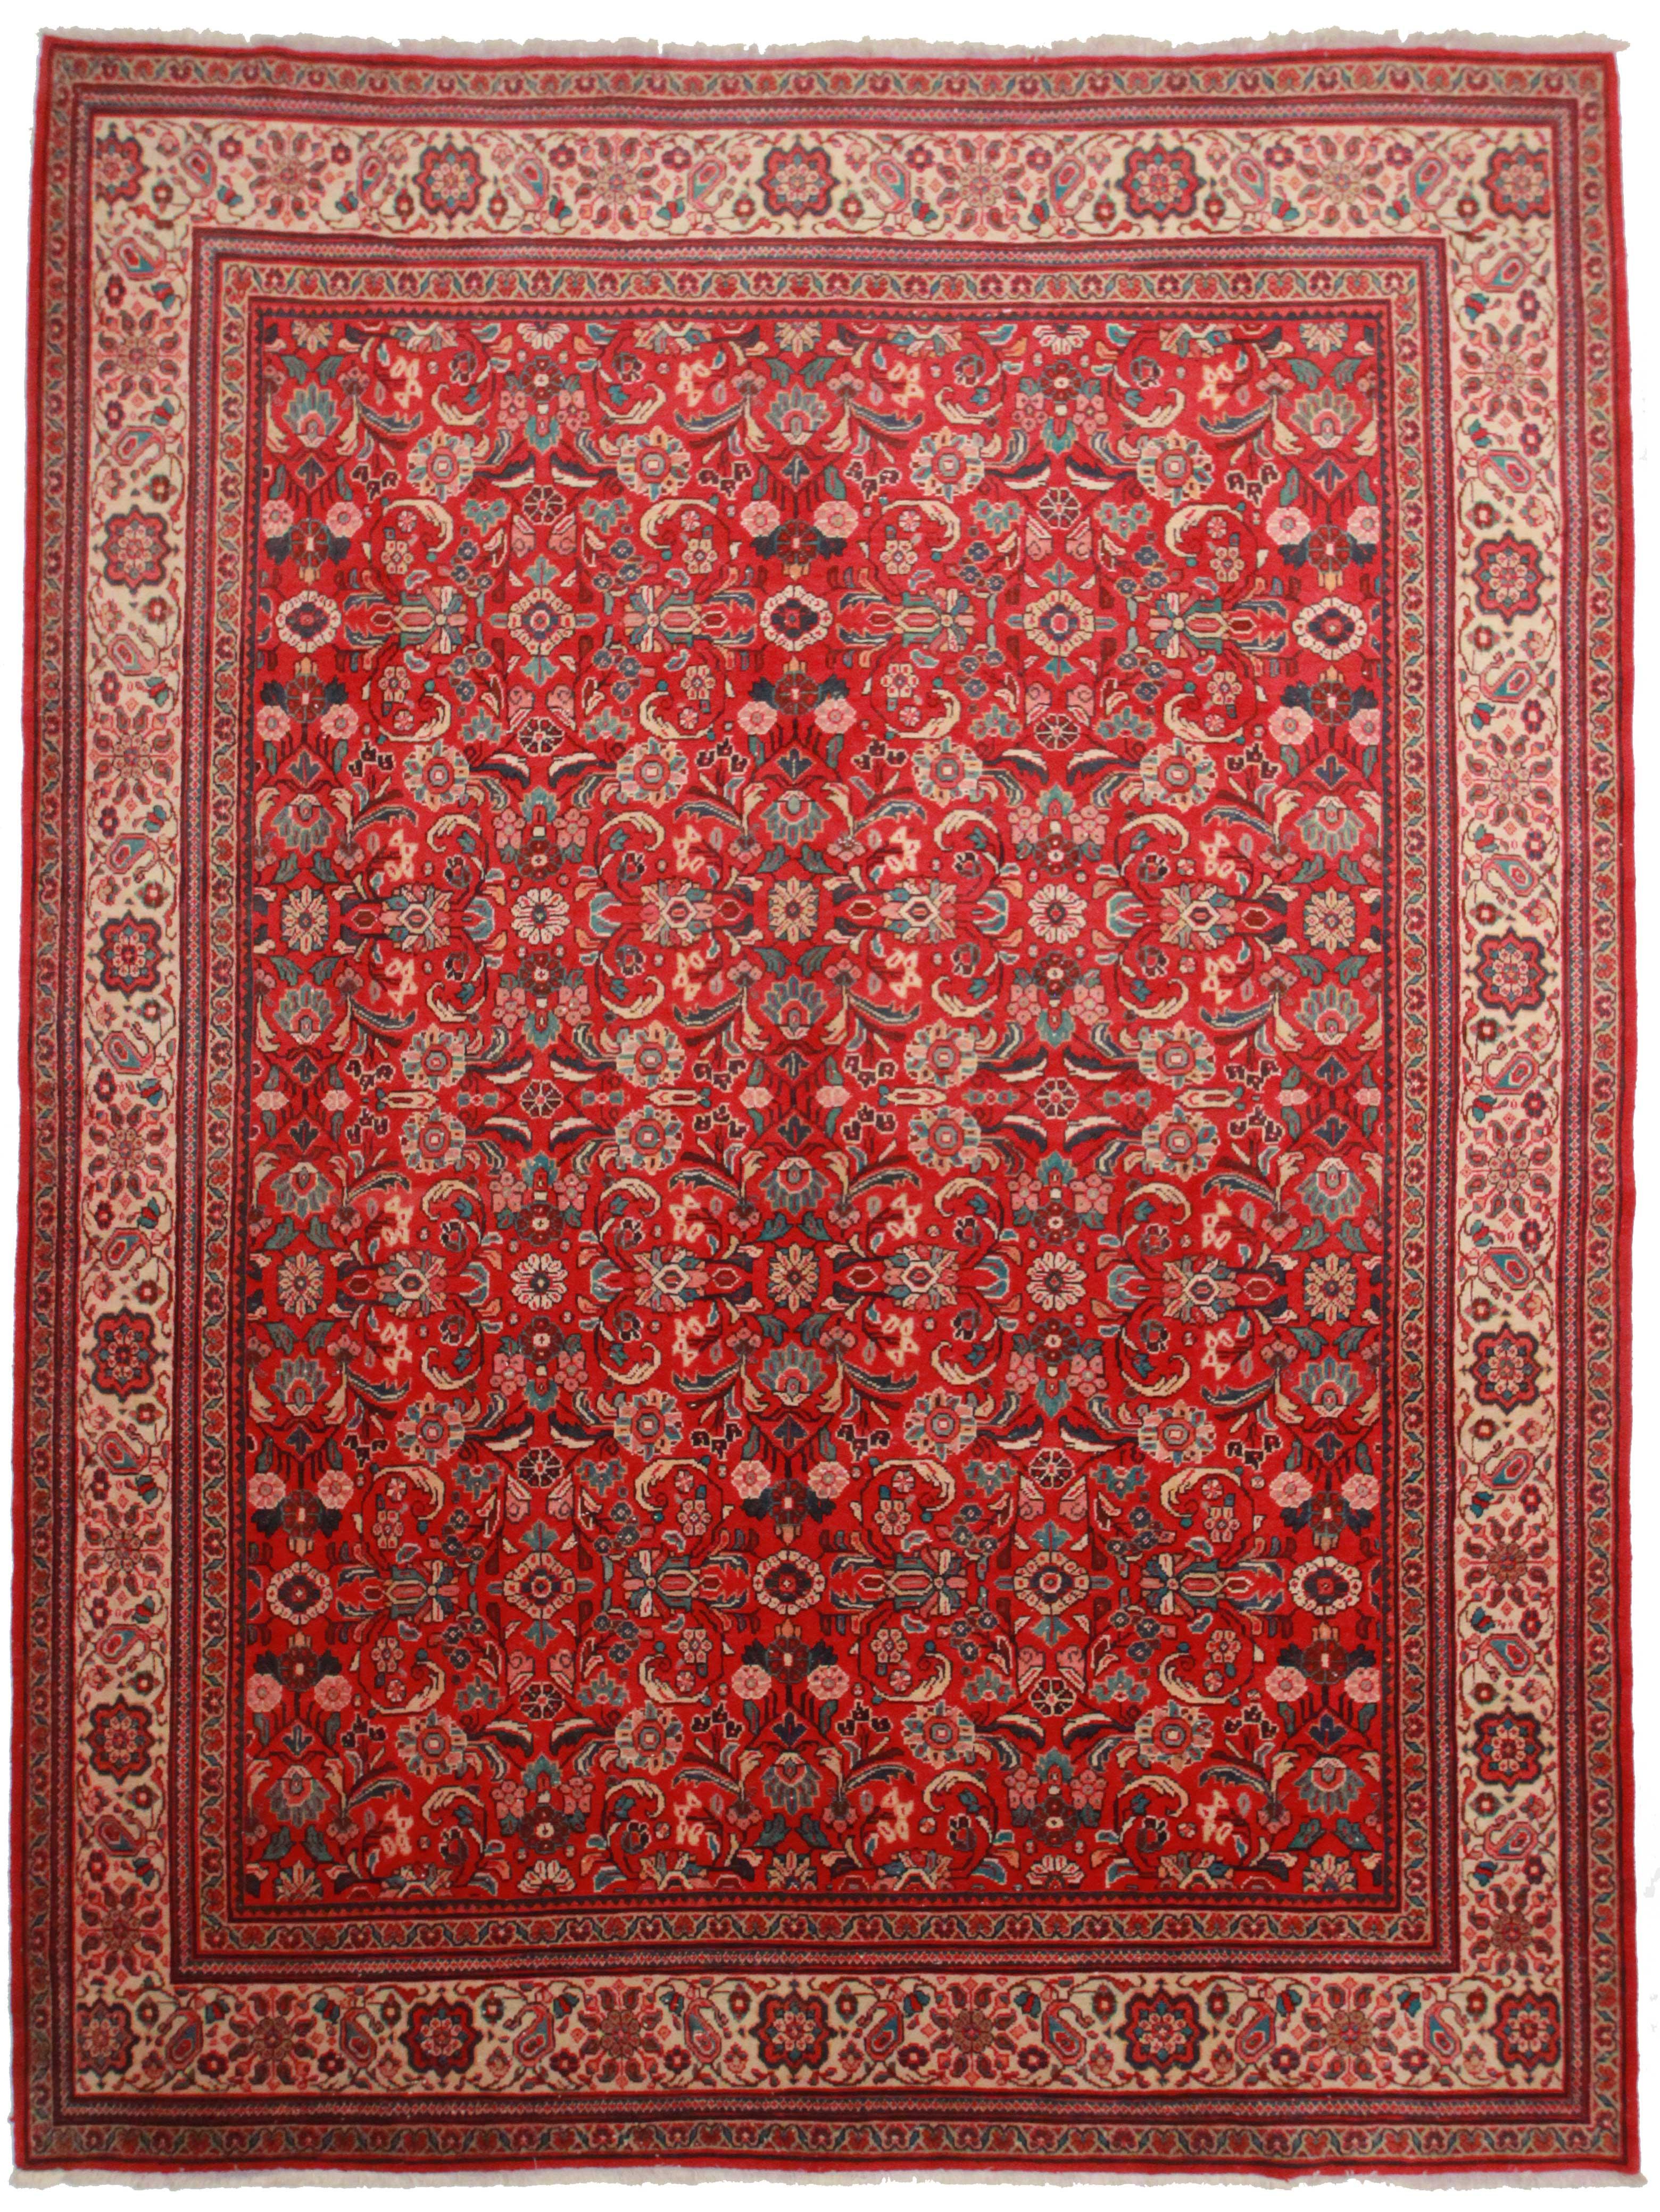 10 X 13 Vintage Persian Mahal Rug 10176 Exclusive